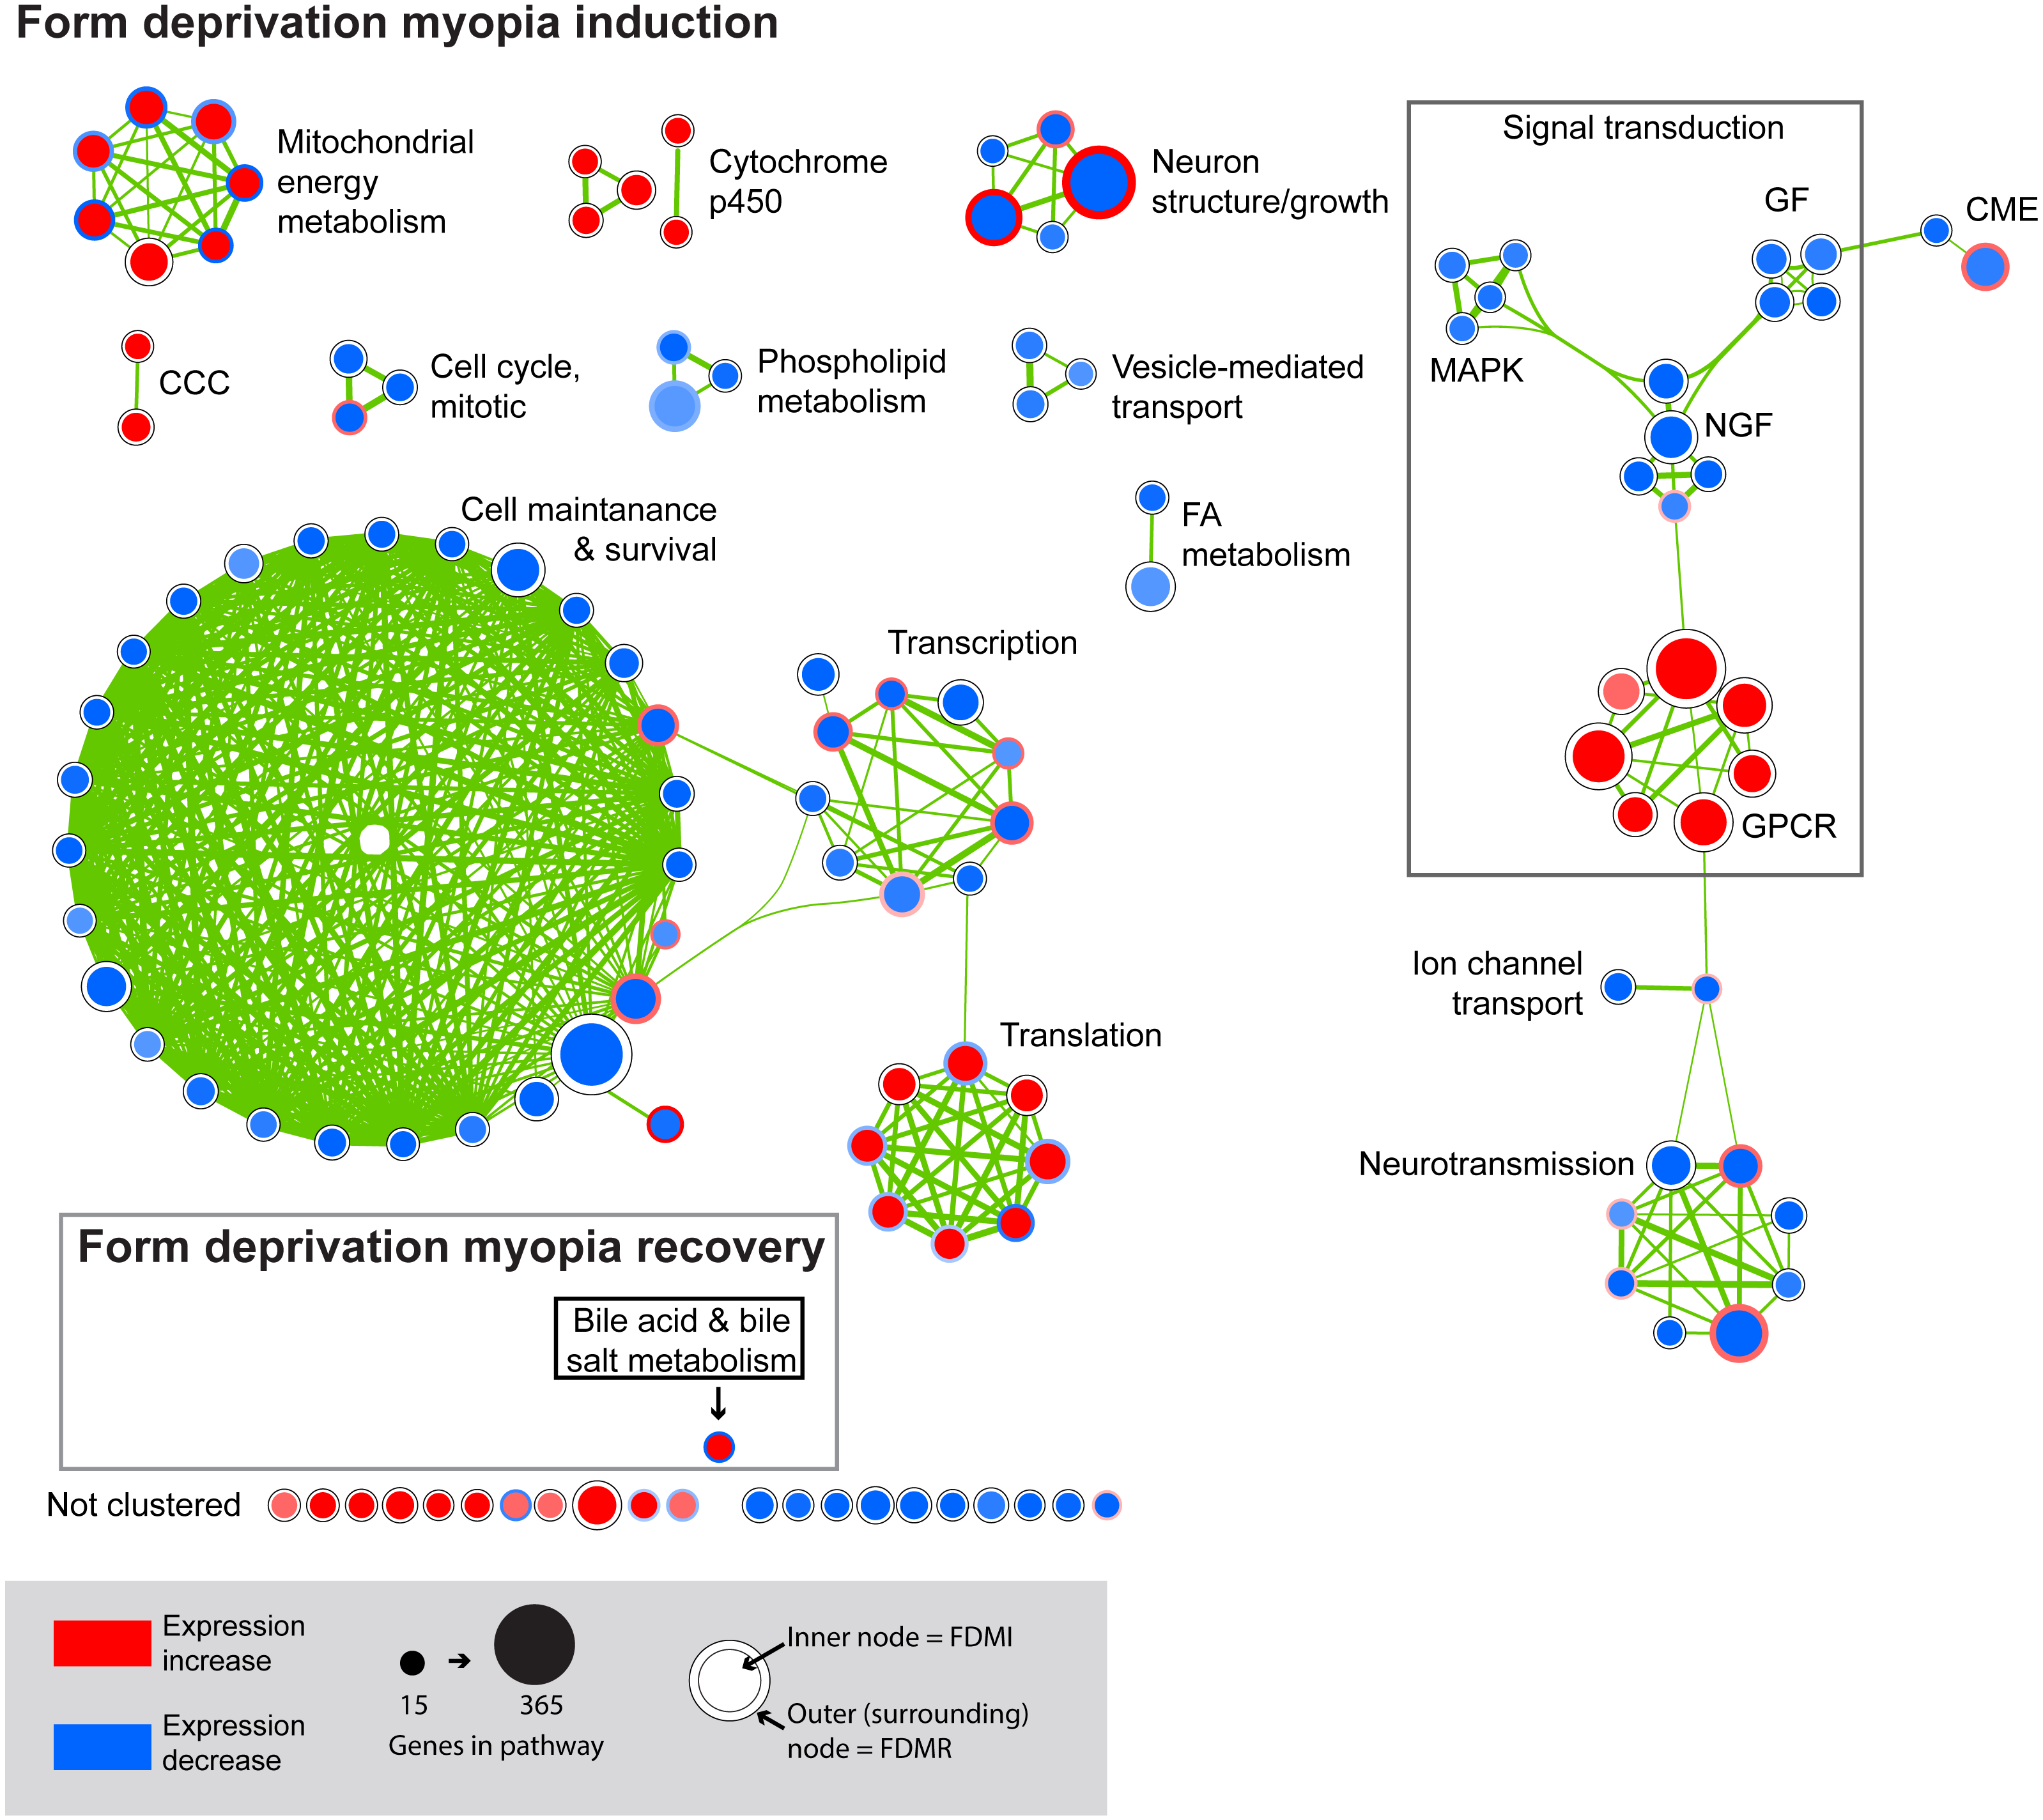 Pathway analysis identifies altered mitochondrial metabolism